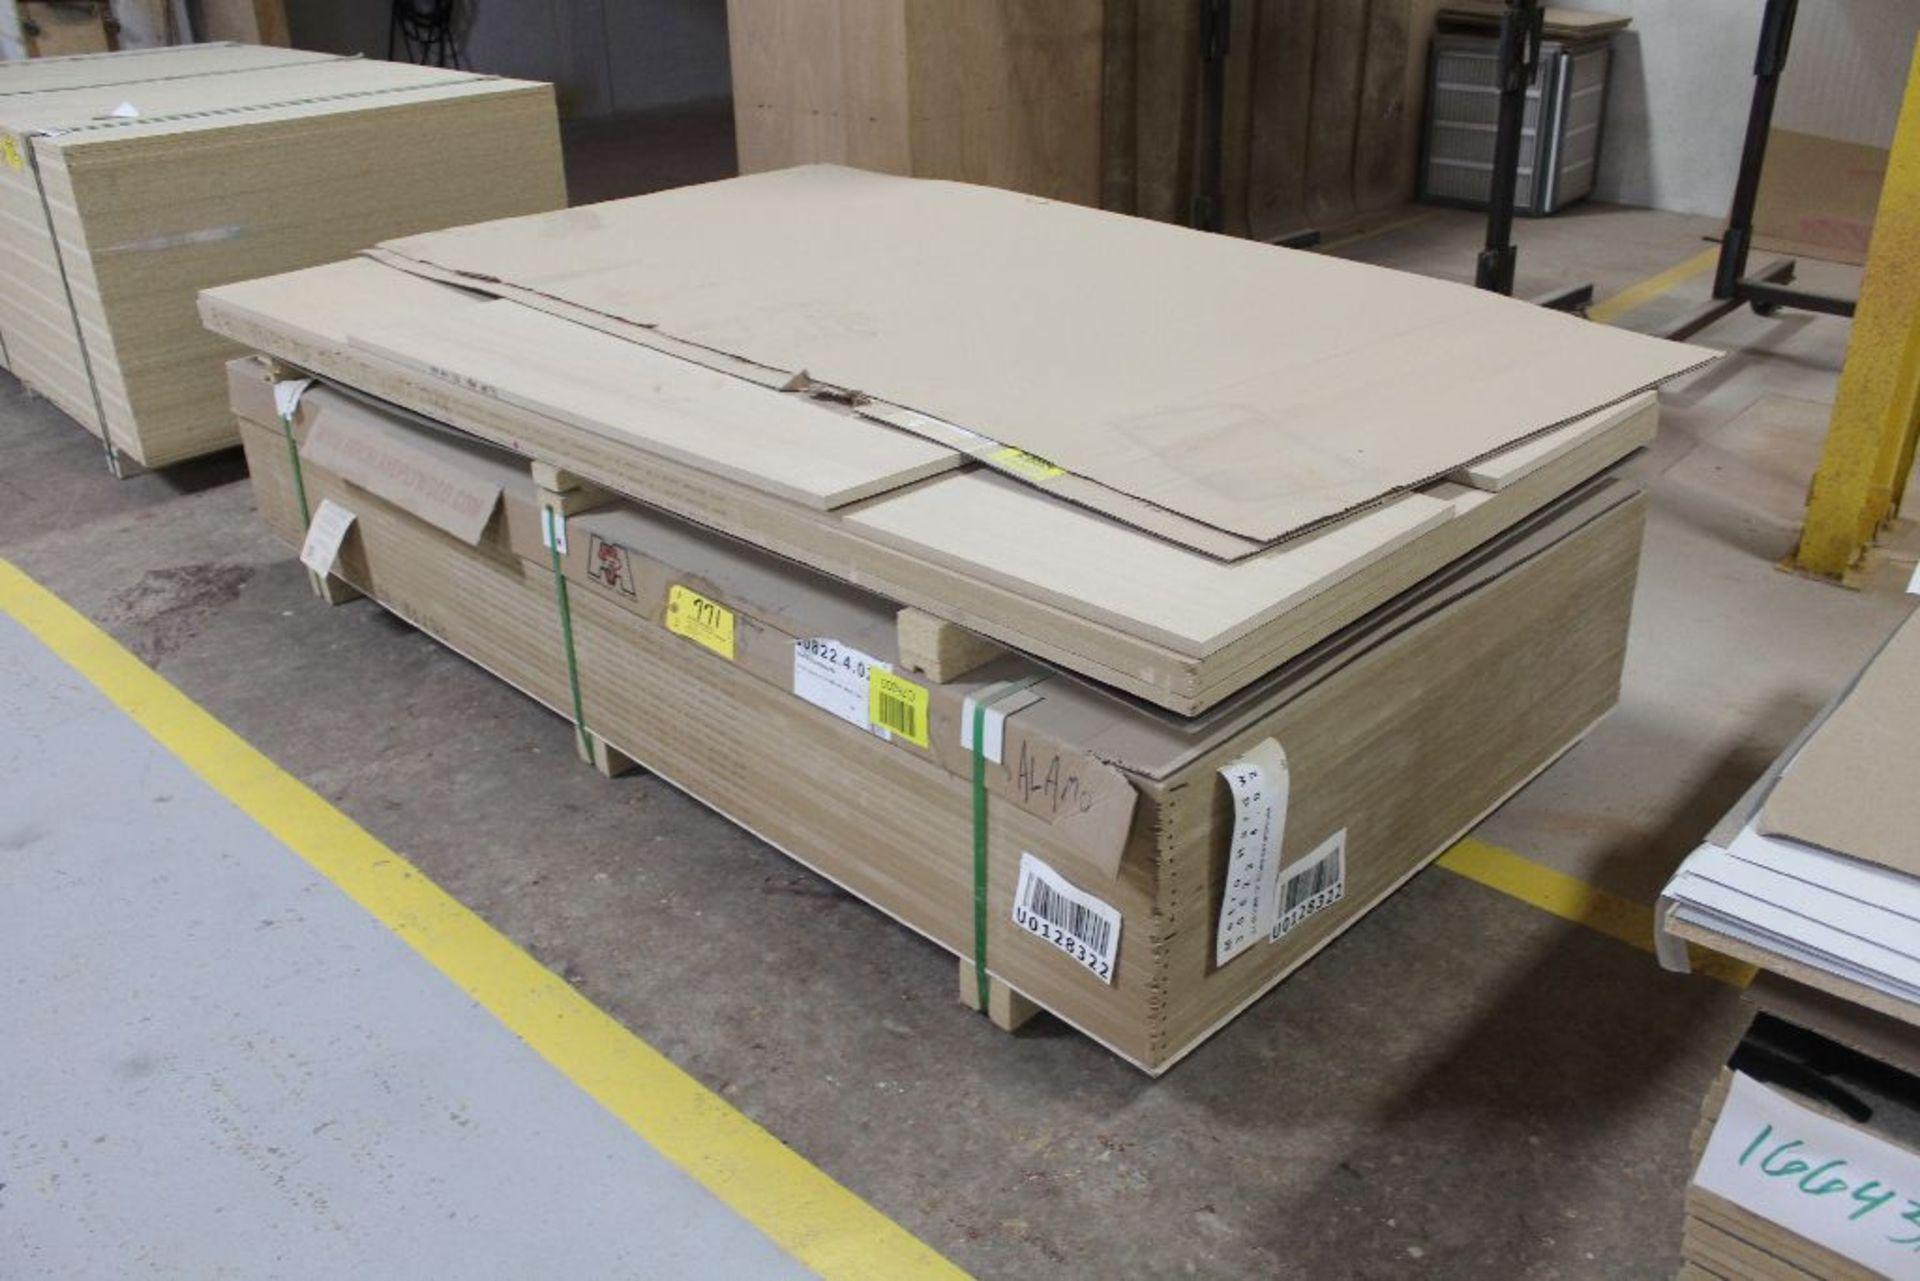 "Lot 771 - Lumber, (24) plywood MDF white oak, 3/4"" x 49"" x 97""."